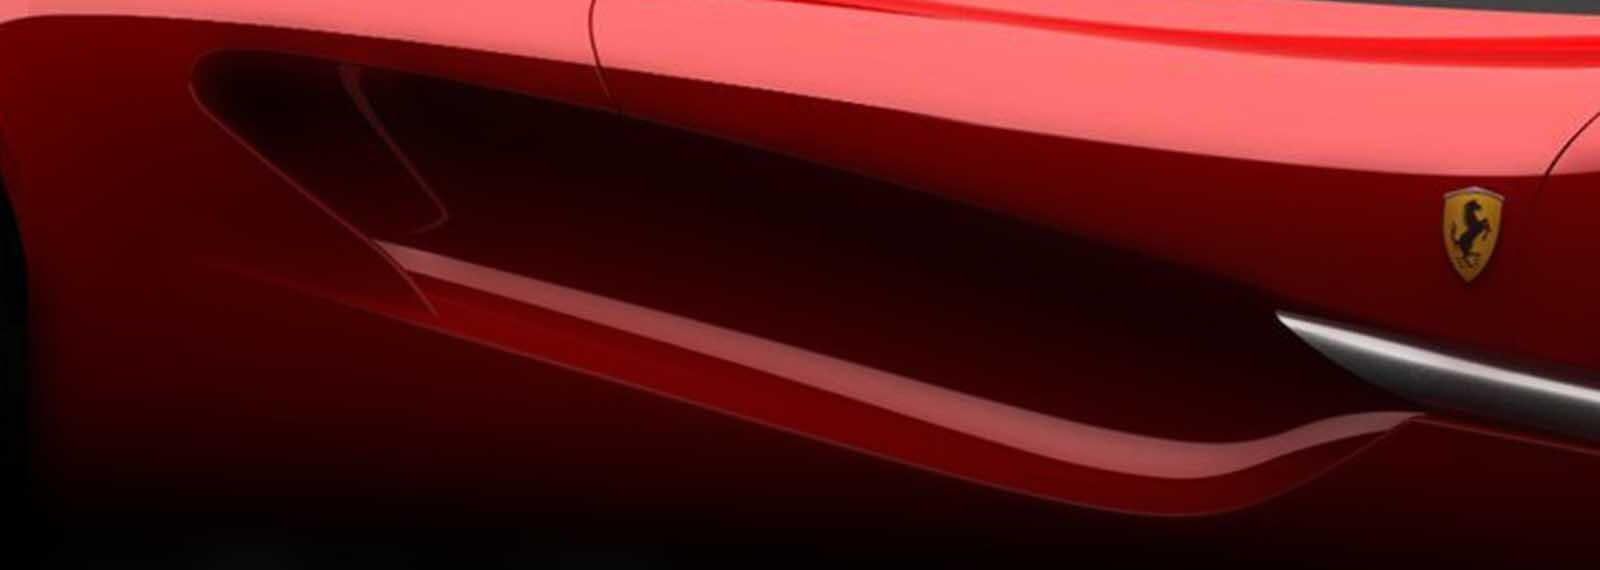 Automan_Ferrari_slide